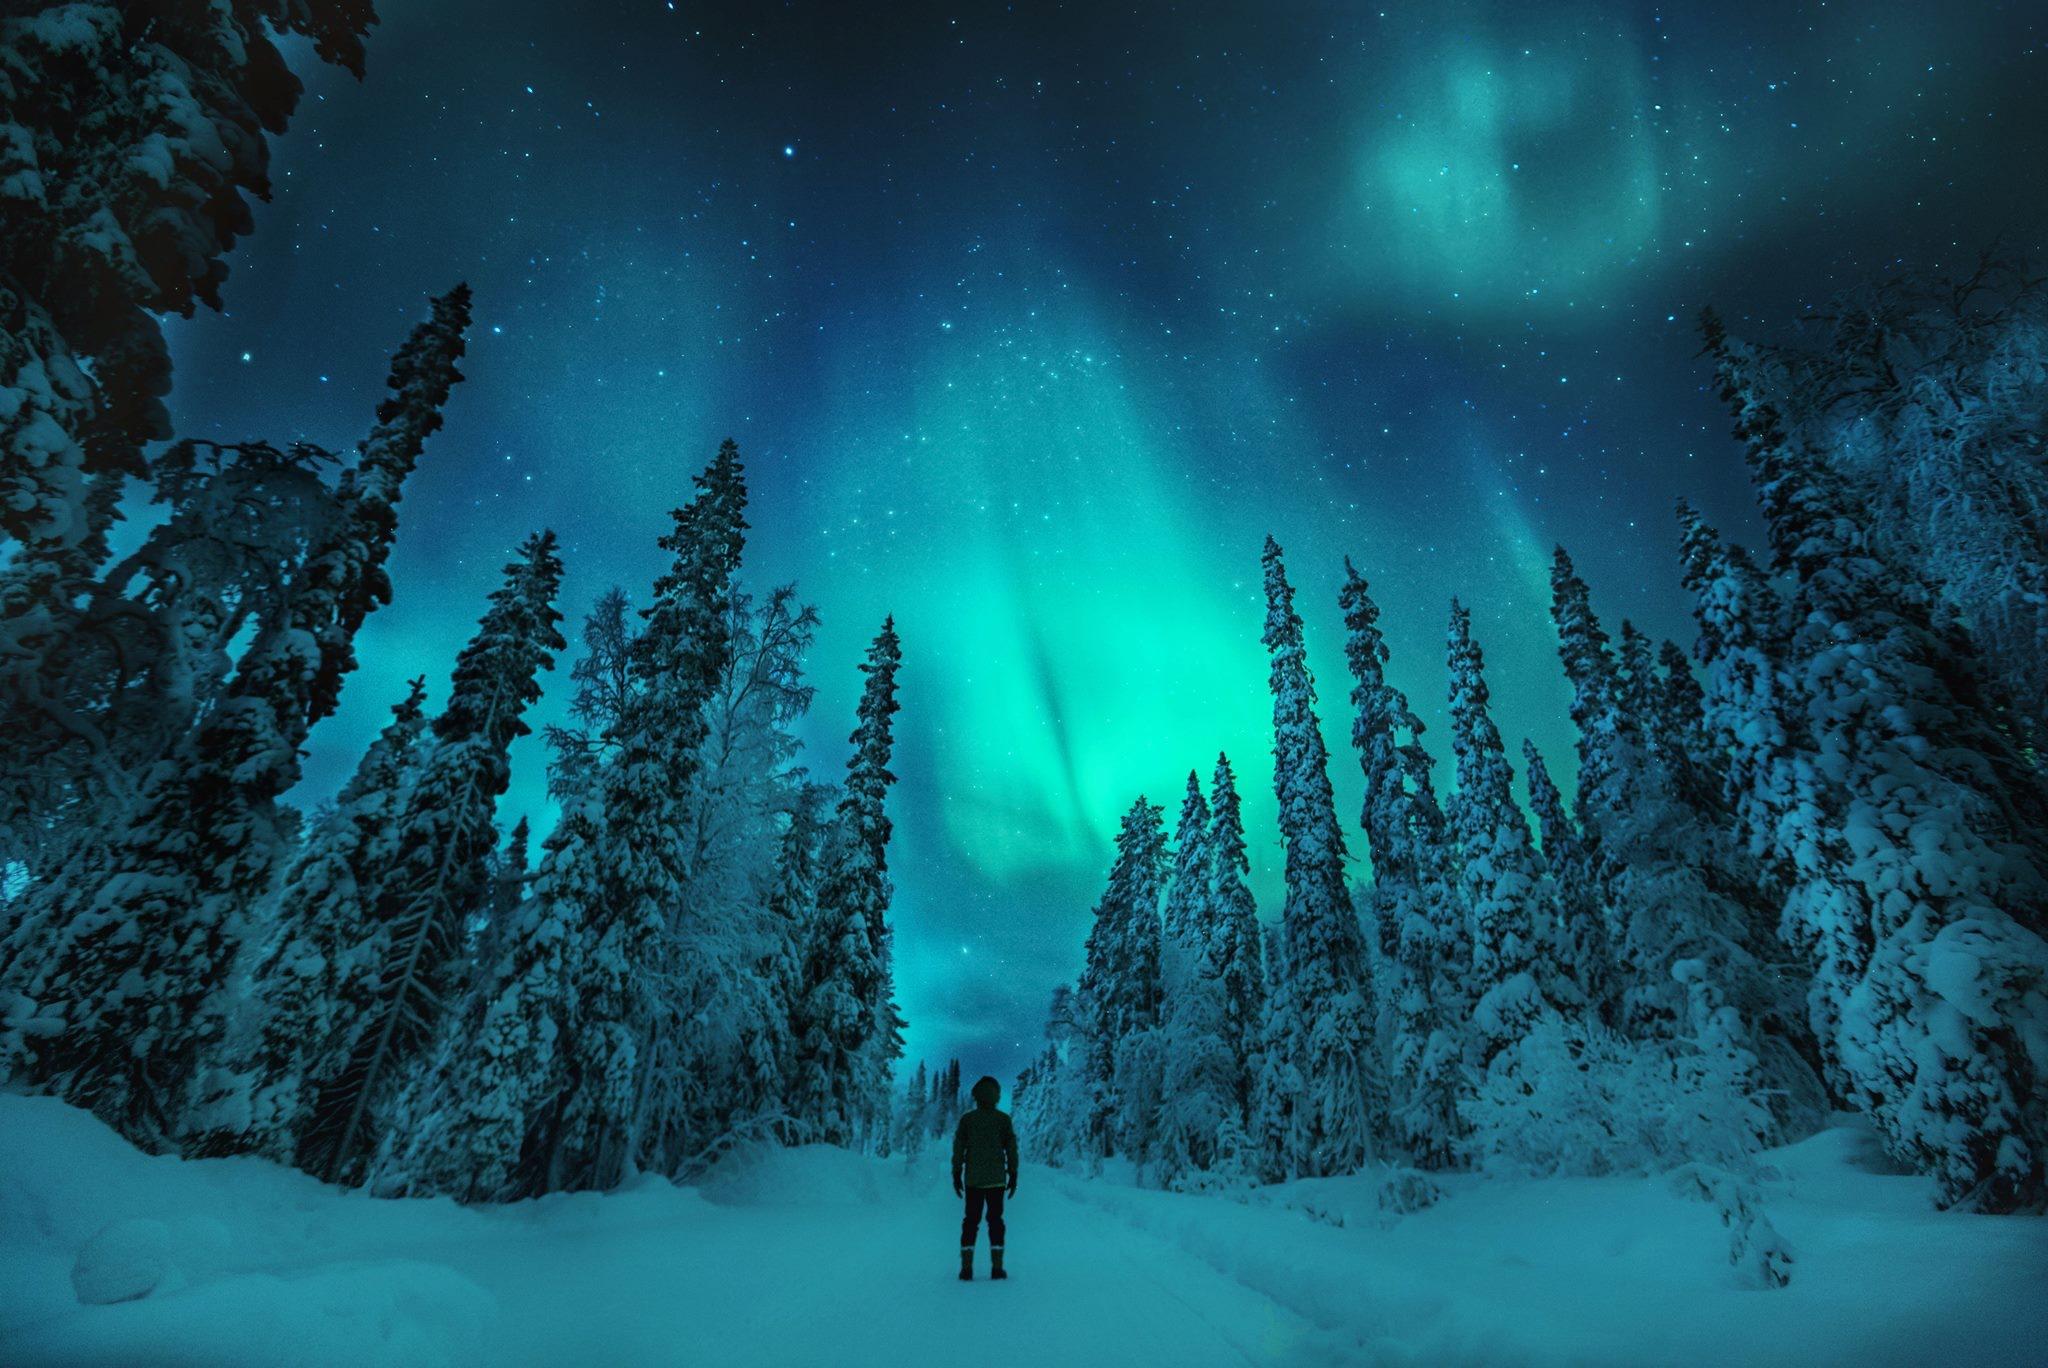 Be nordic - zenitudeprofondelemag.com